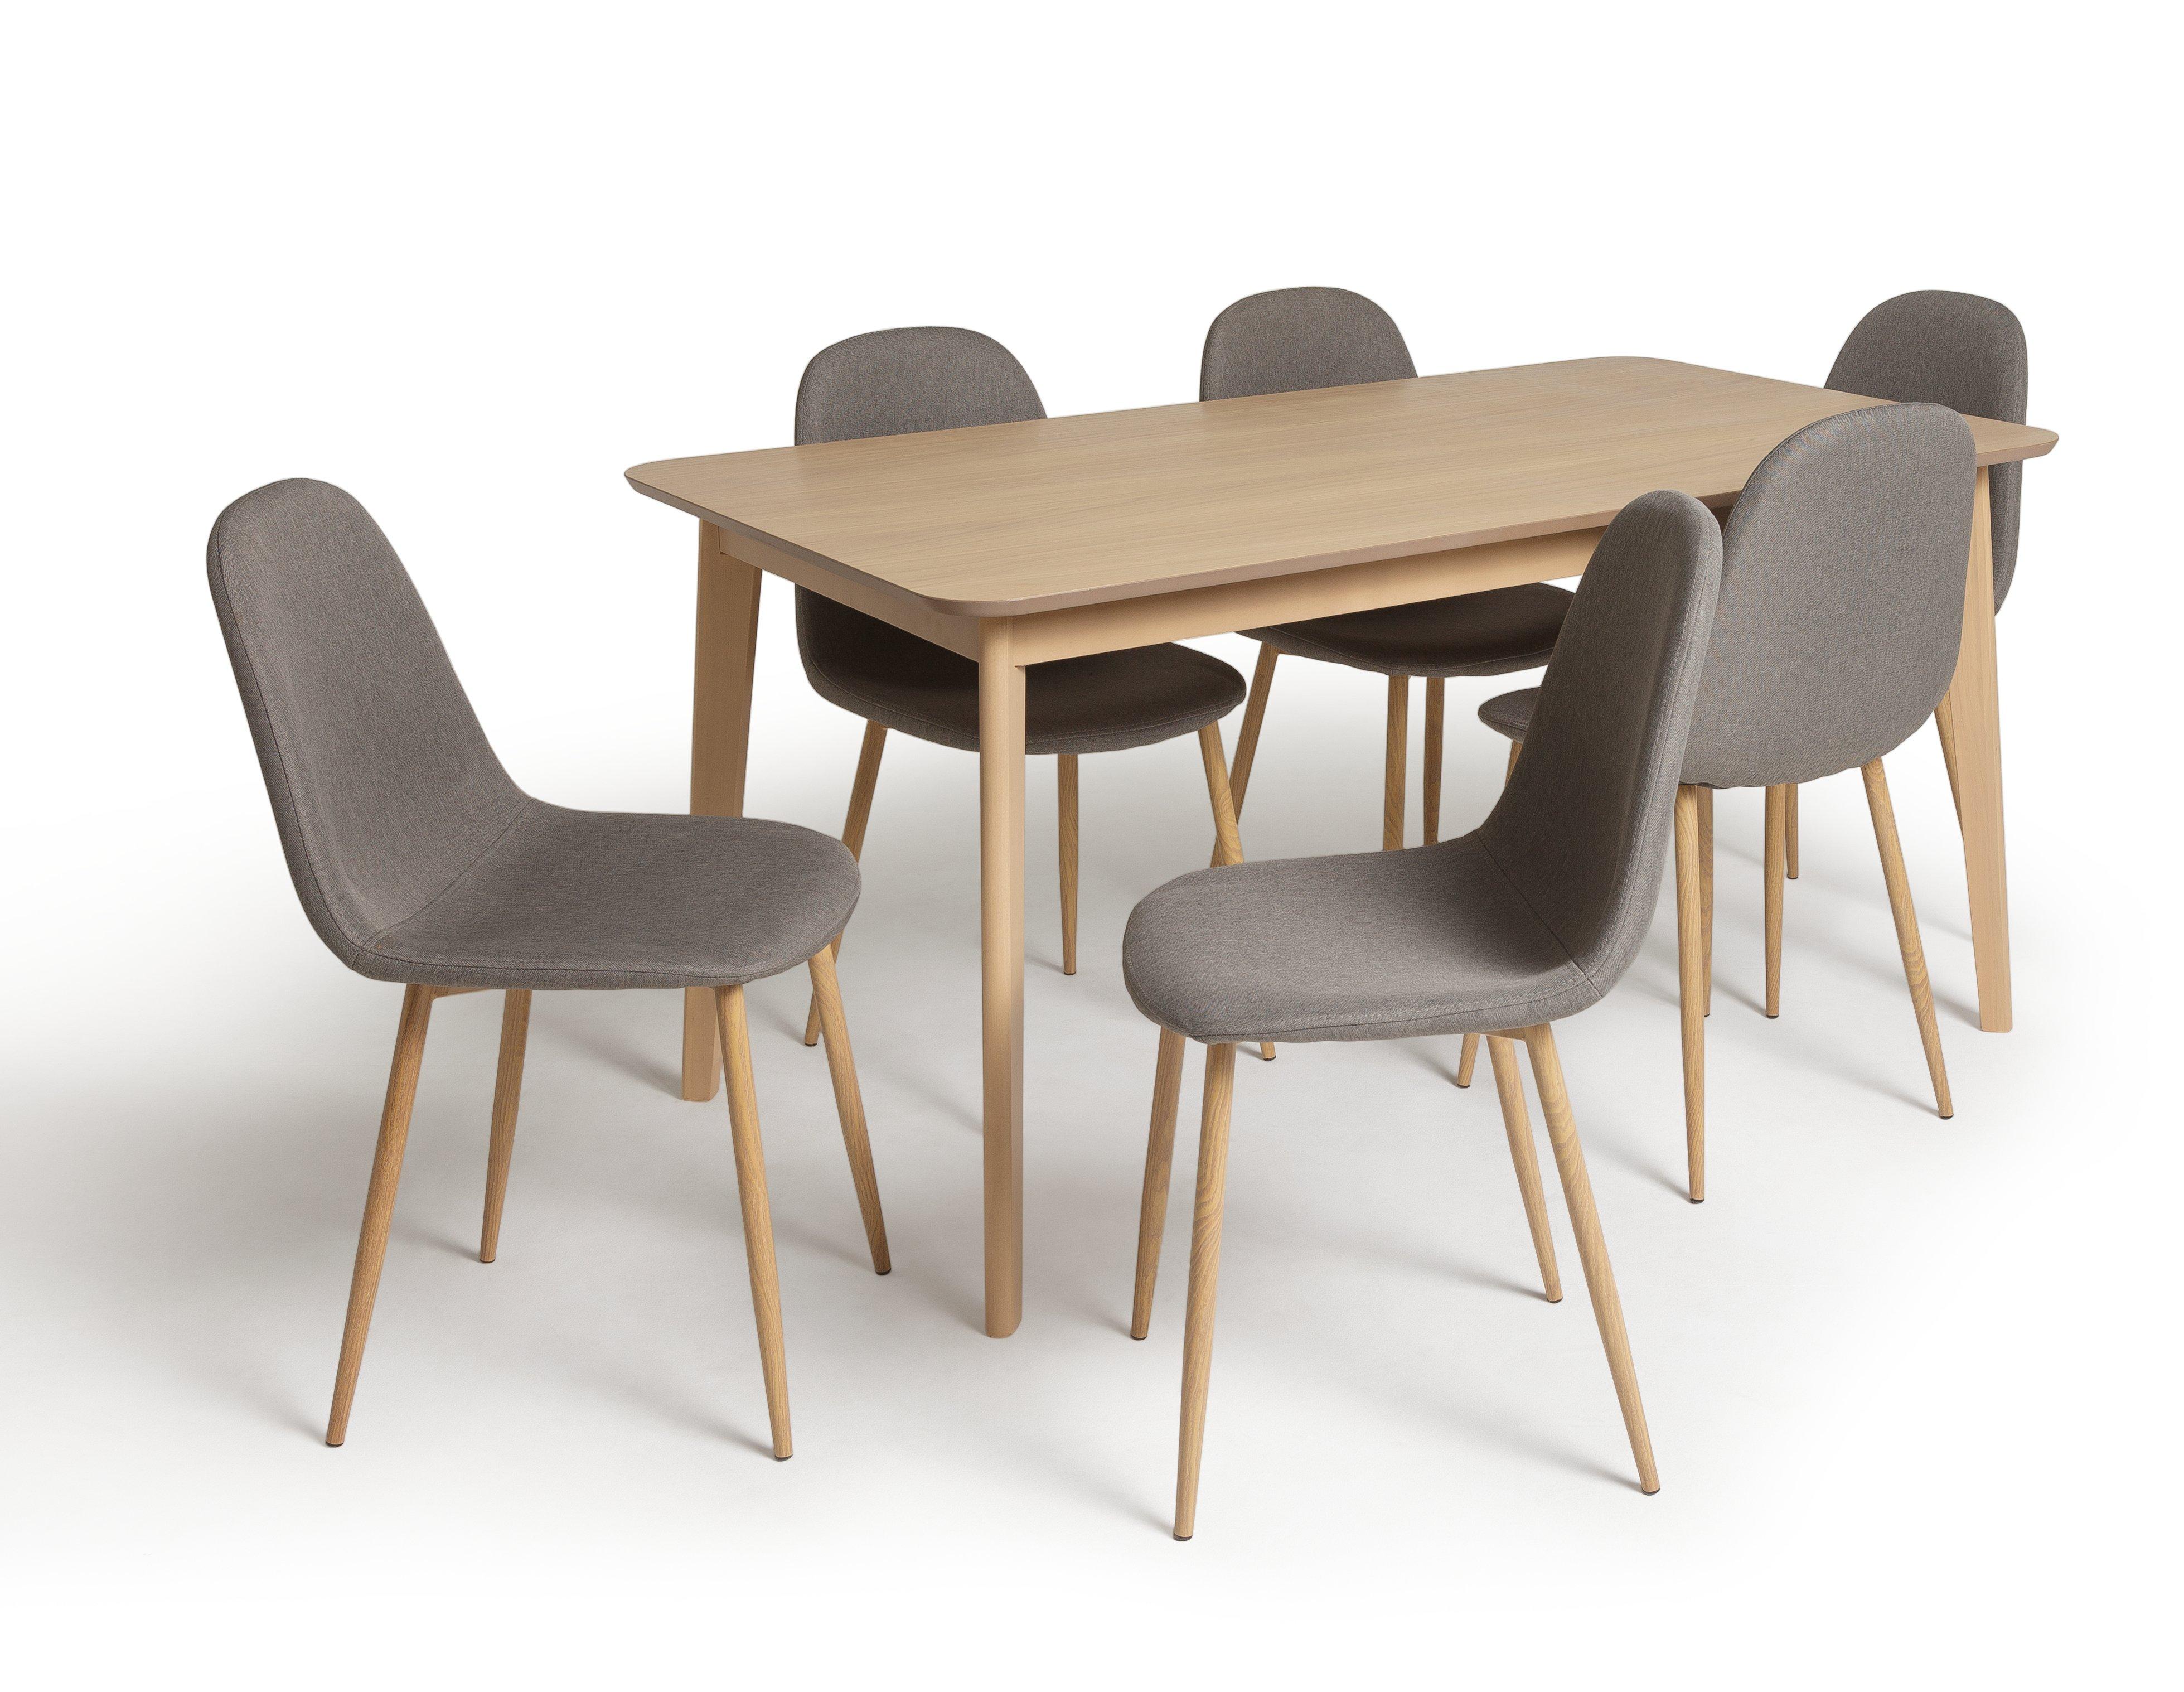 Habitat Skandi Wood Dining Table and 6 Beni Grey Chairs